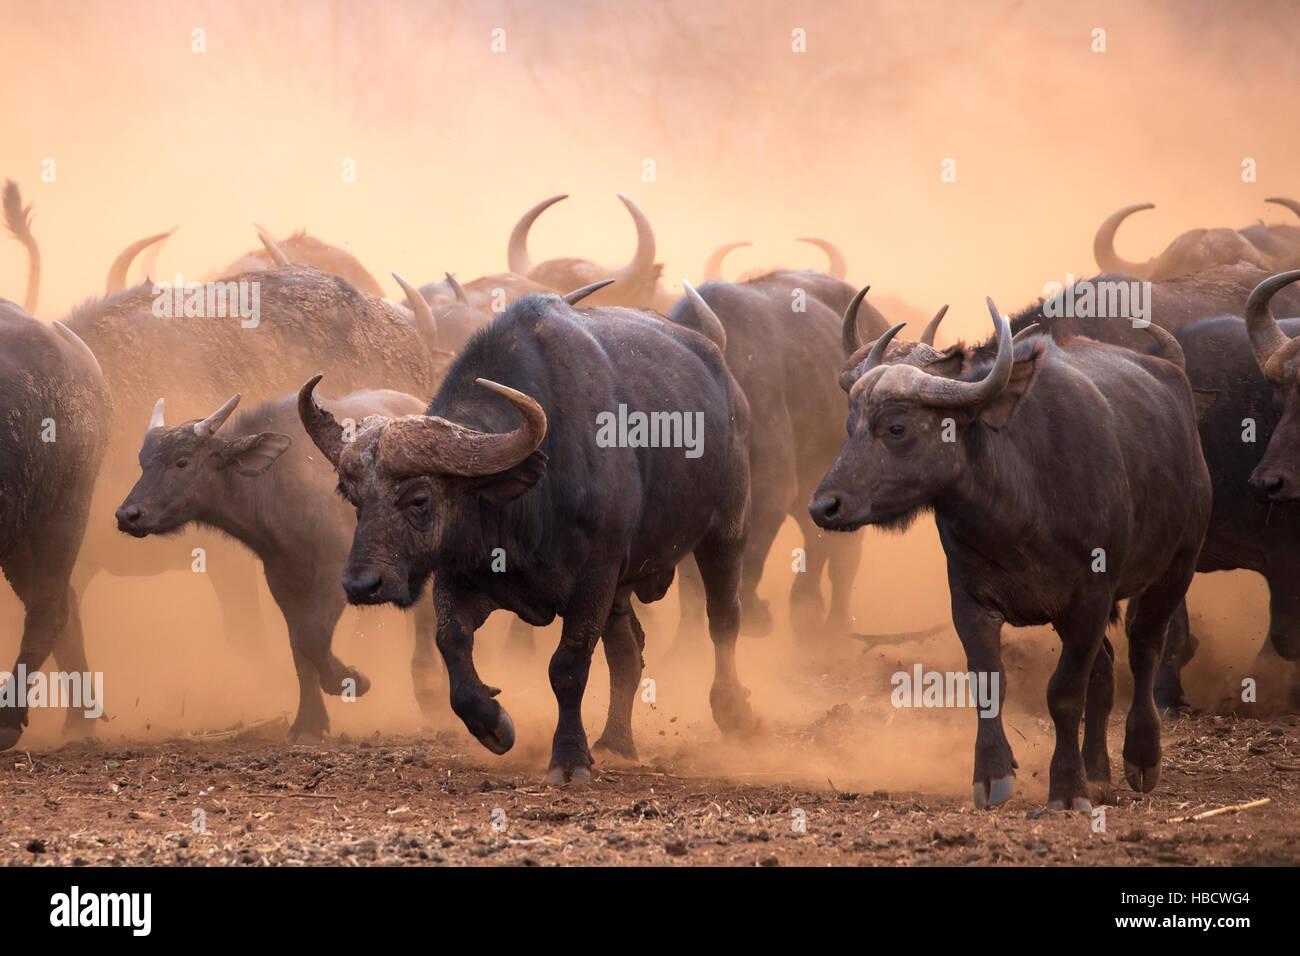 Cape buffalo (Syncerus caffer) herd, Zimanga private game reserve, KwaZulu-Natal, South Africa Stock Photo